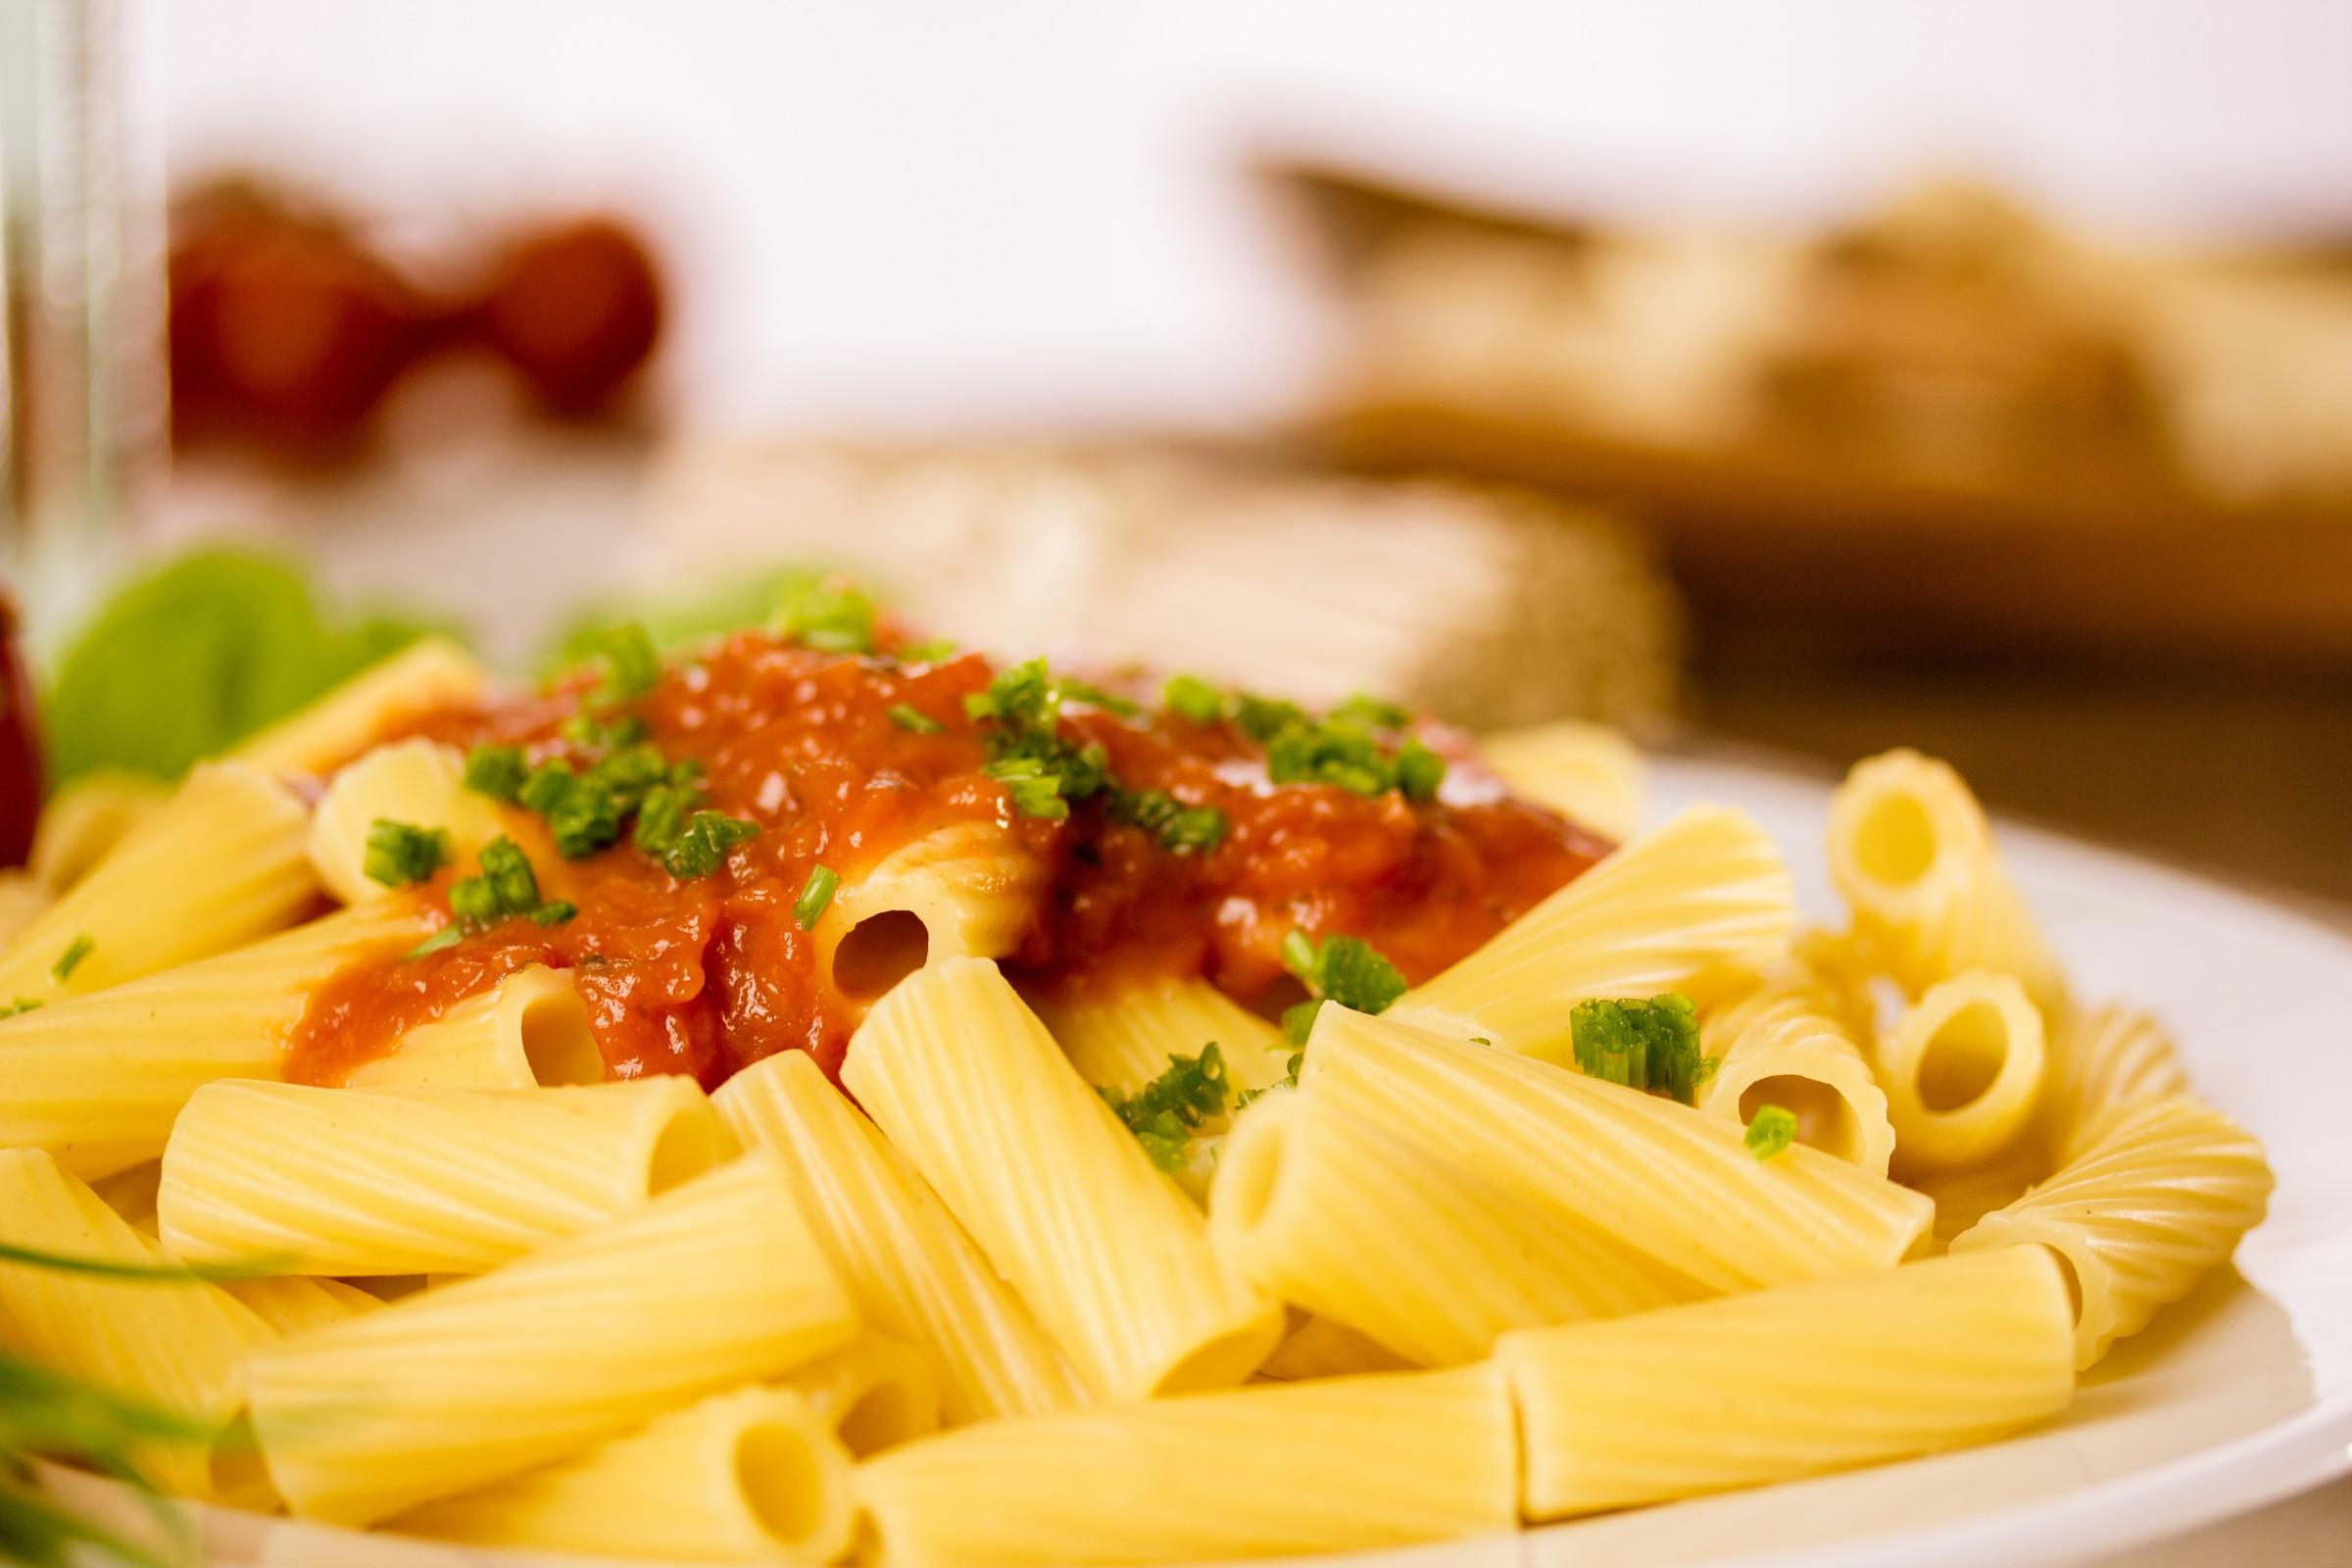 pølser med spaghetti i